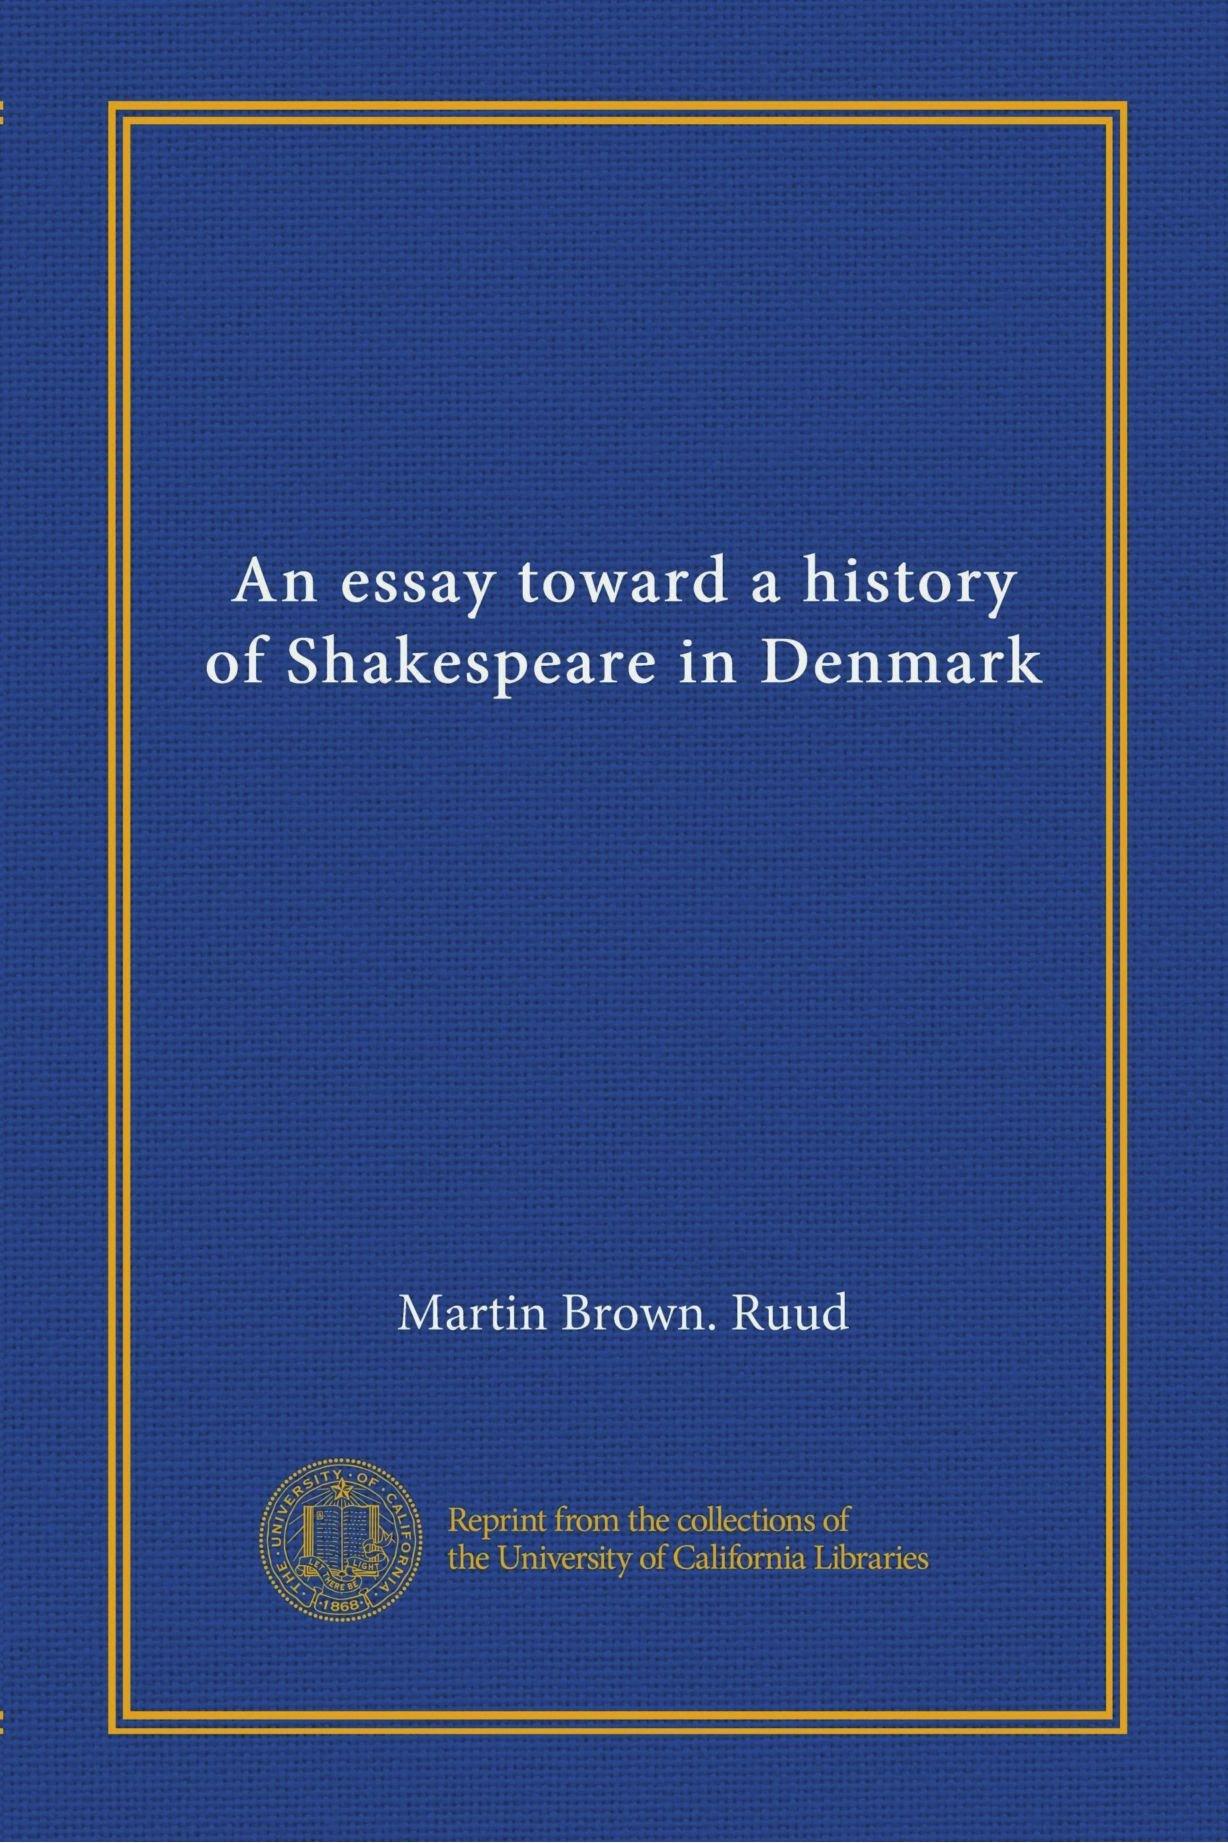 An essay toward a history of Shakespeare in Denmark ebook